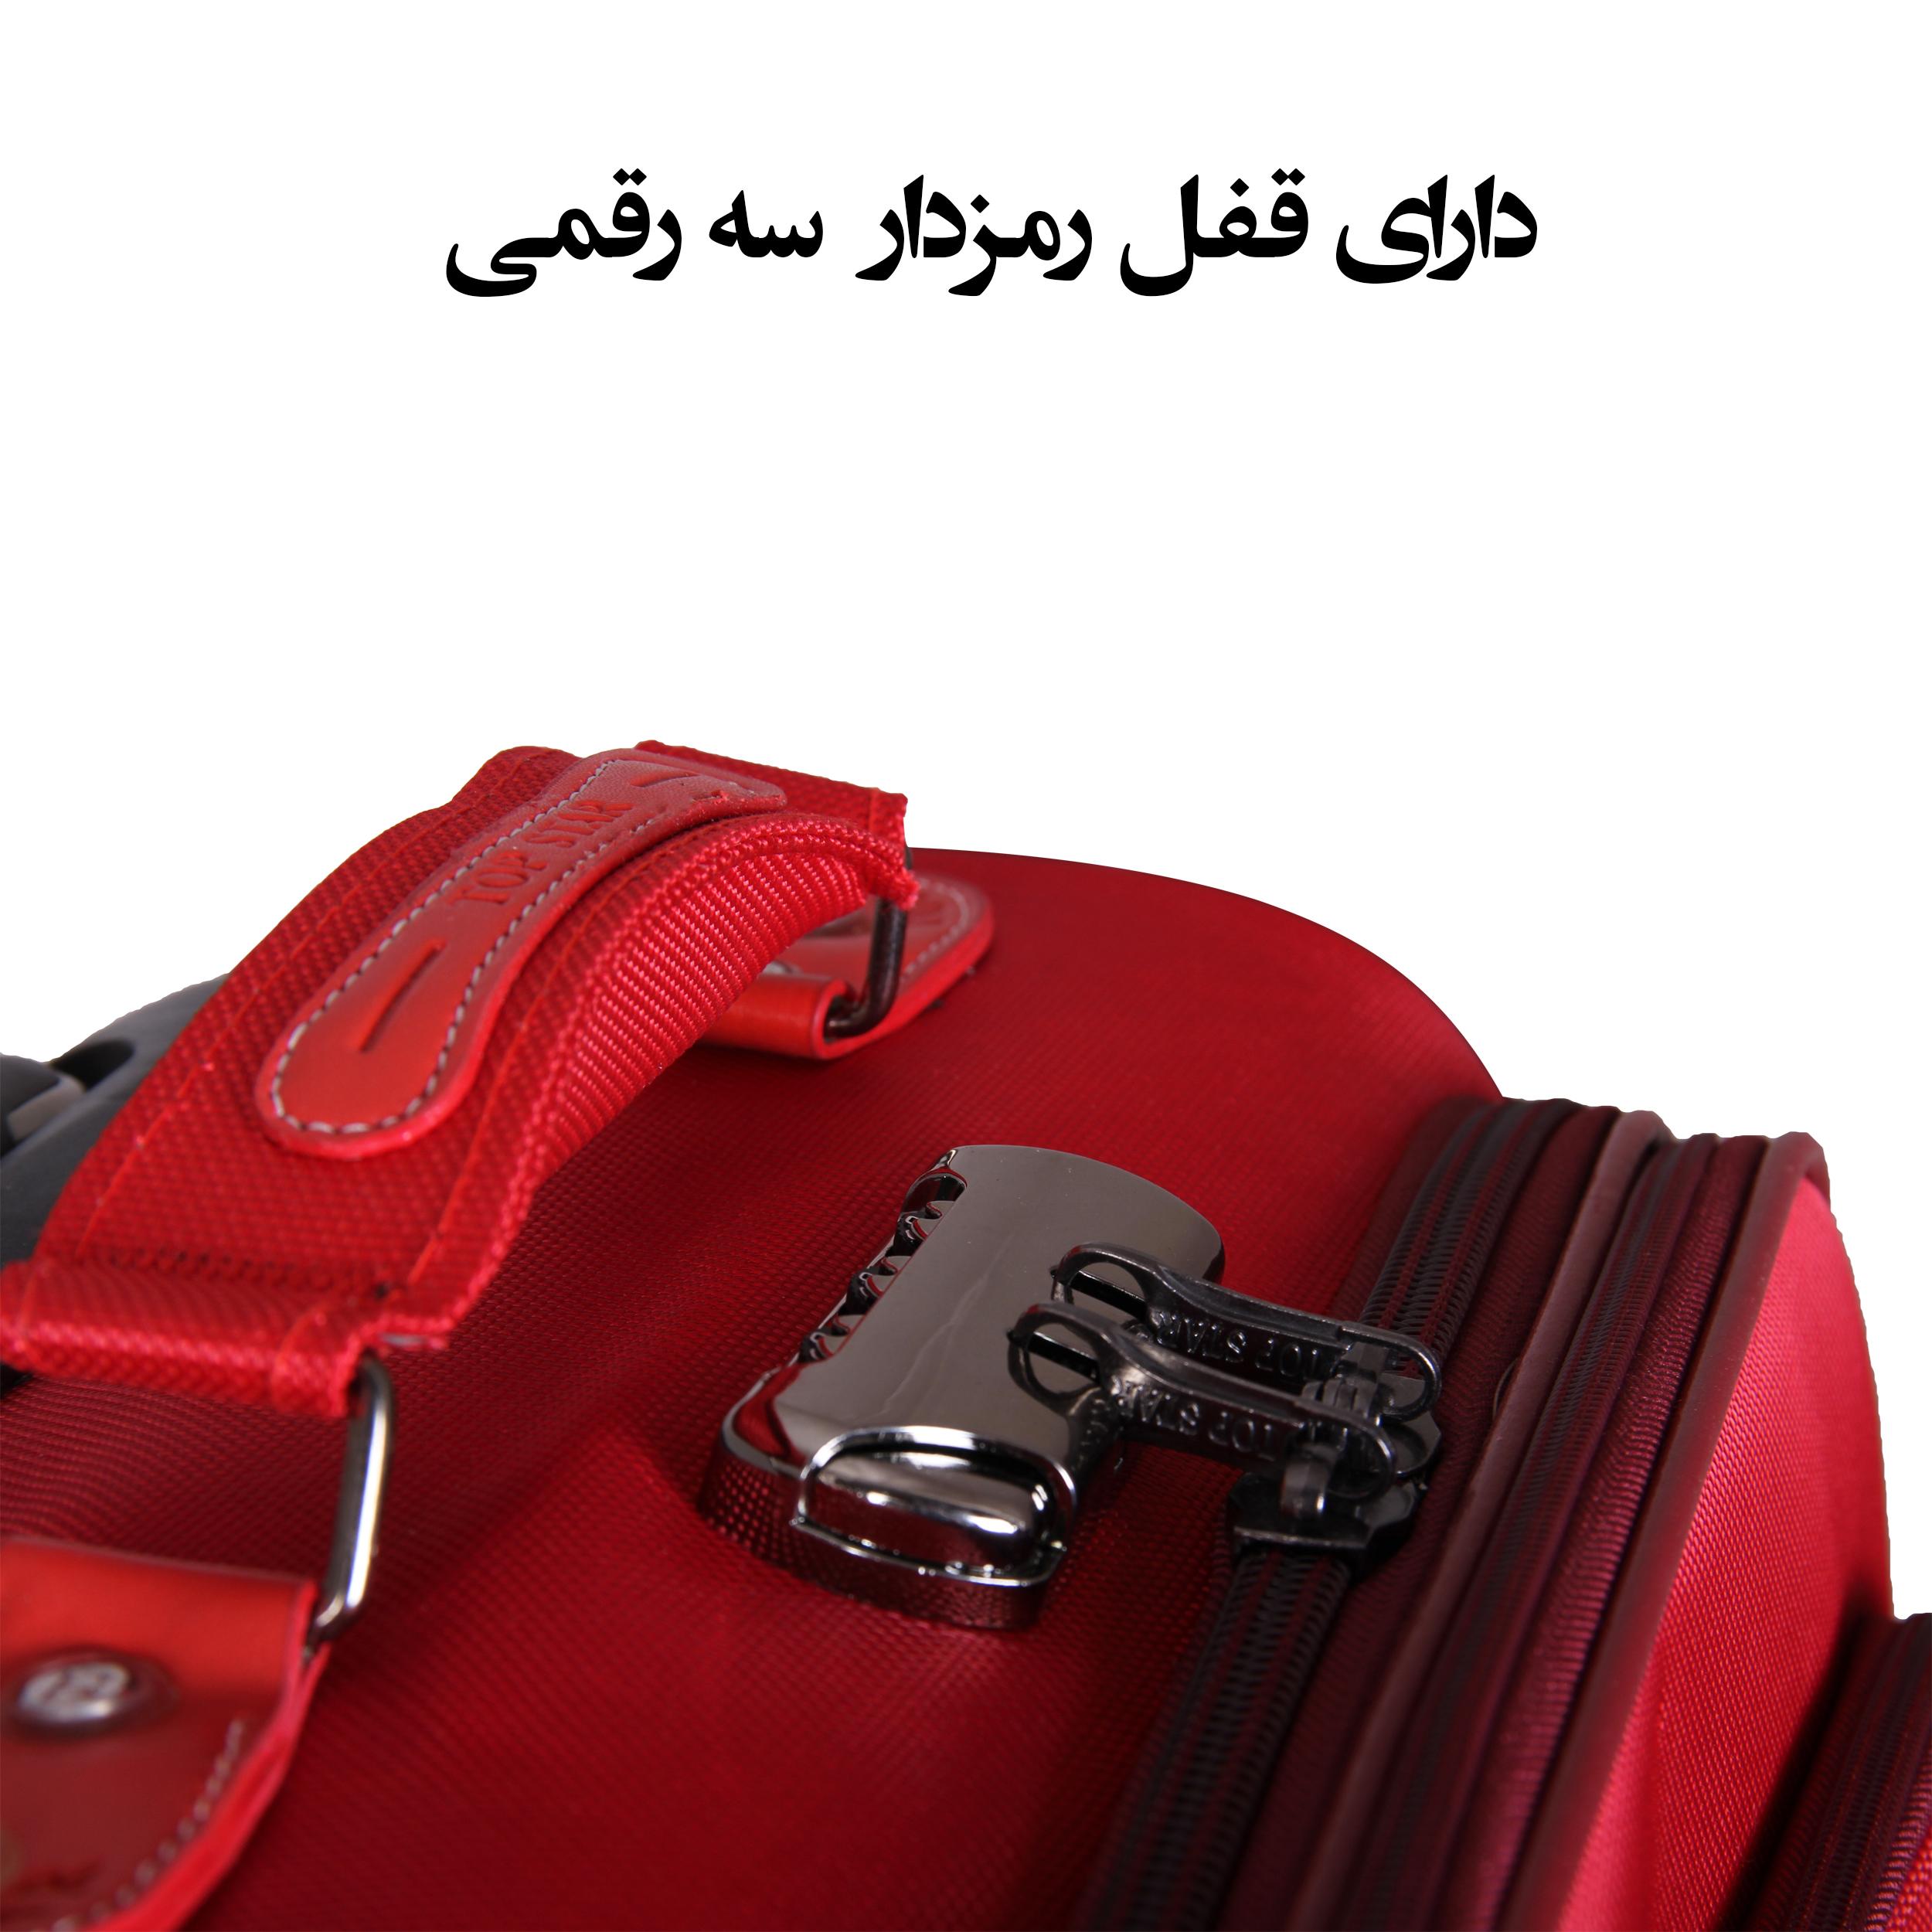 مجموعه سه عددی چمدان کدA1034 main 1 14